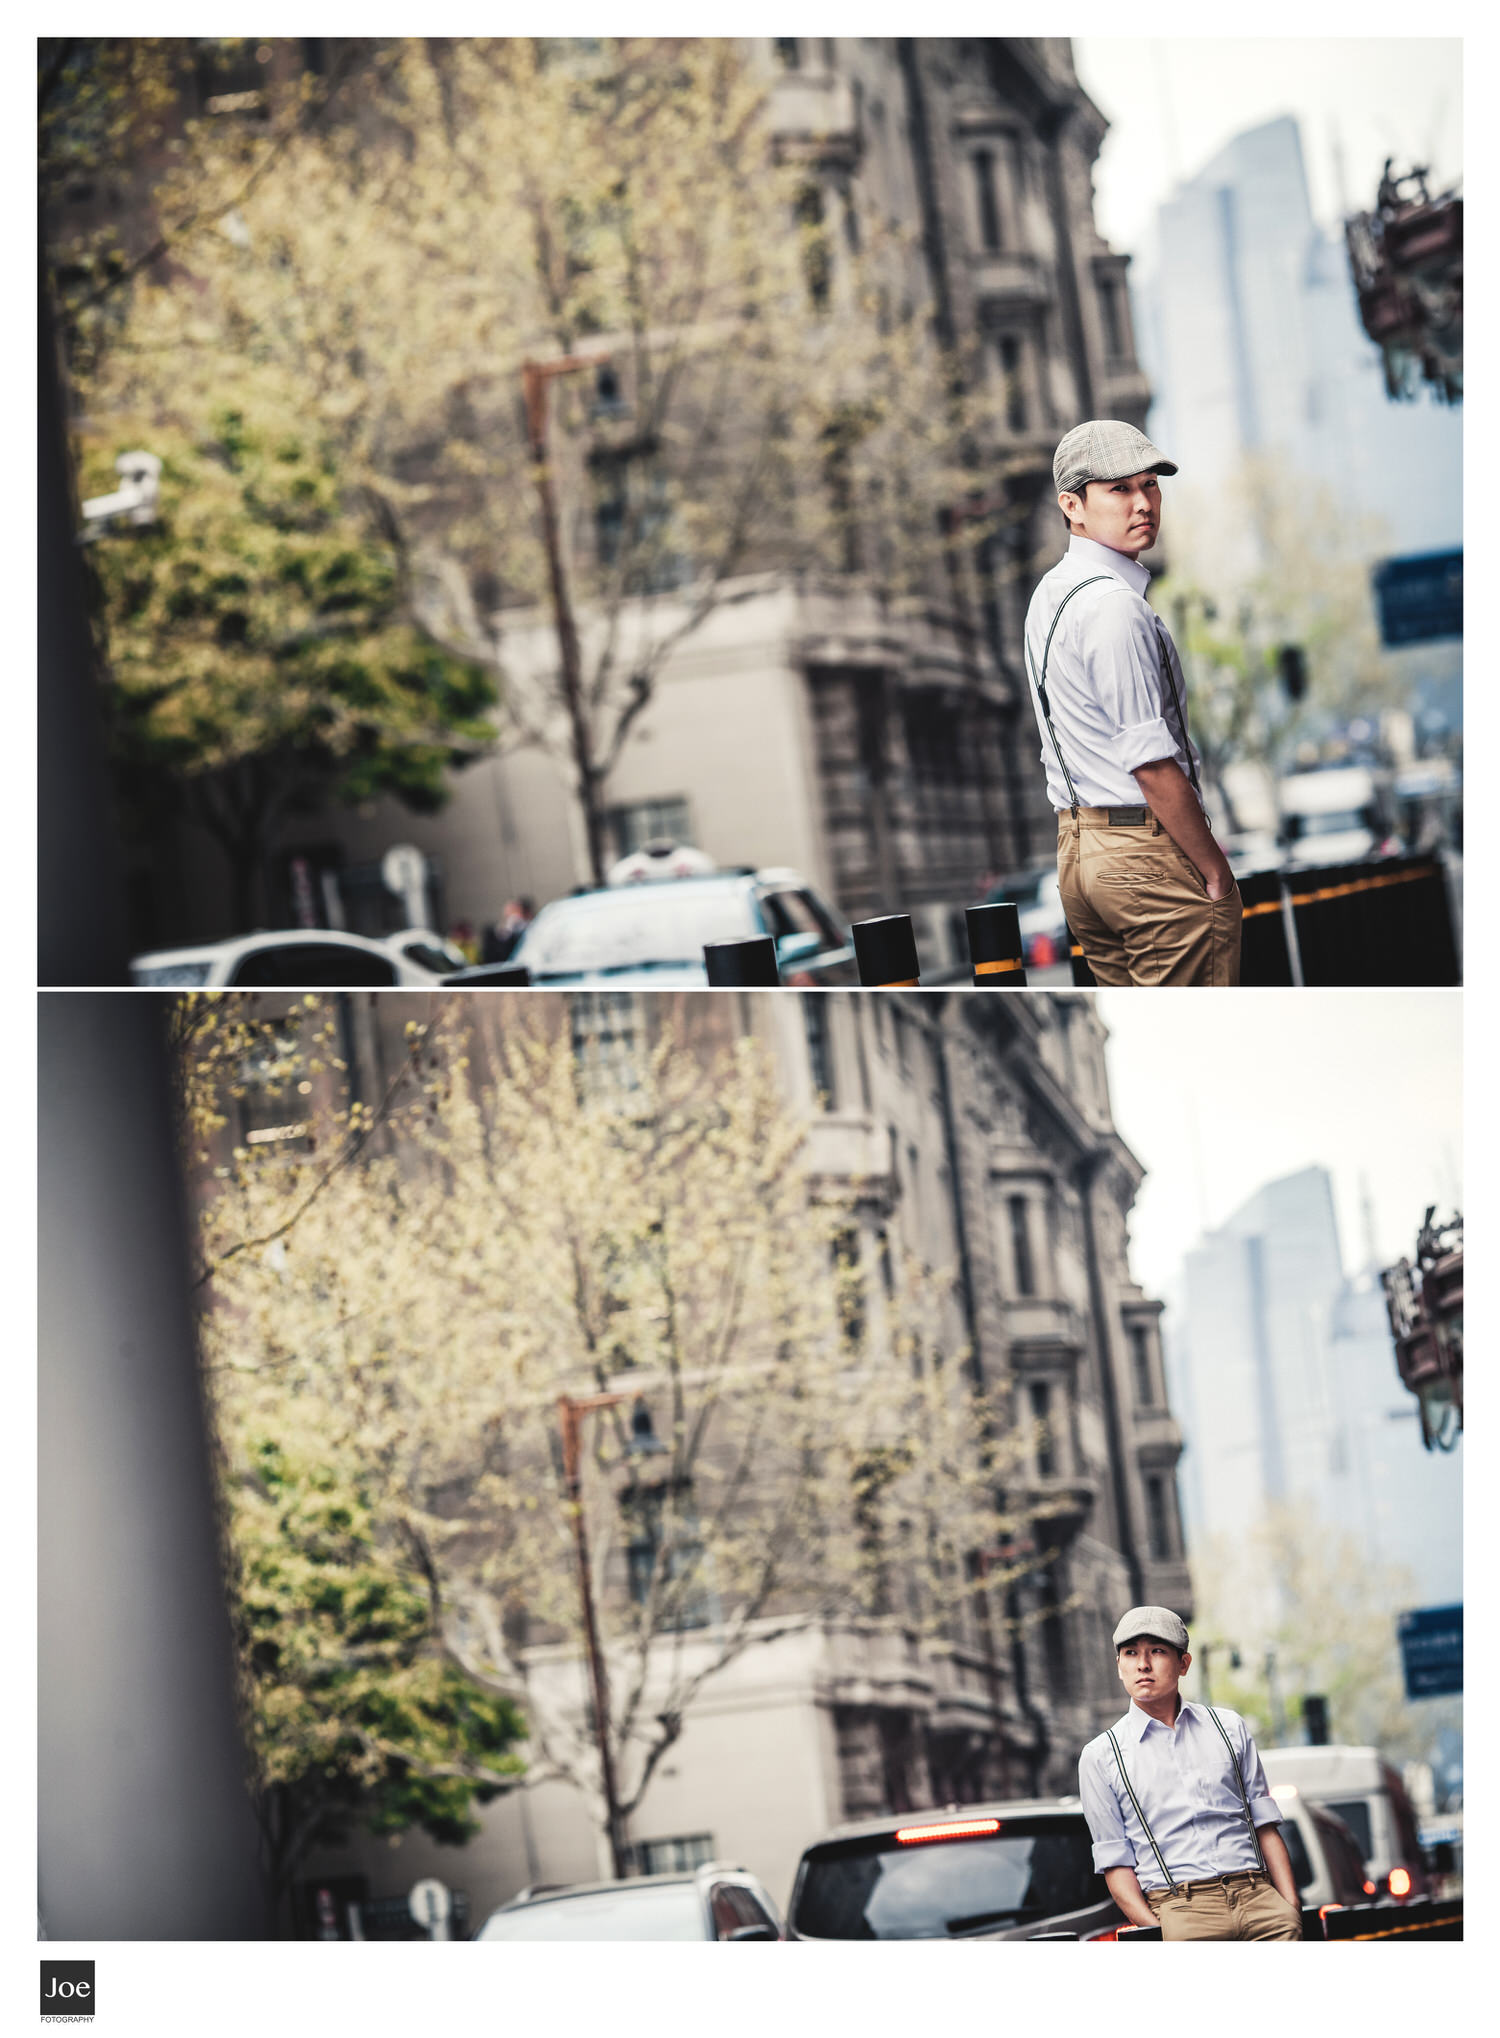 shanghai-pre-wedding-photography-21-ebby-calvin-joe-fotography.jpg